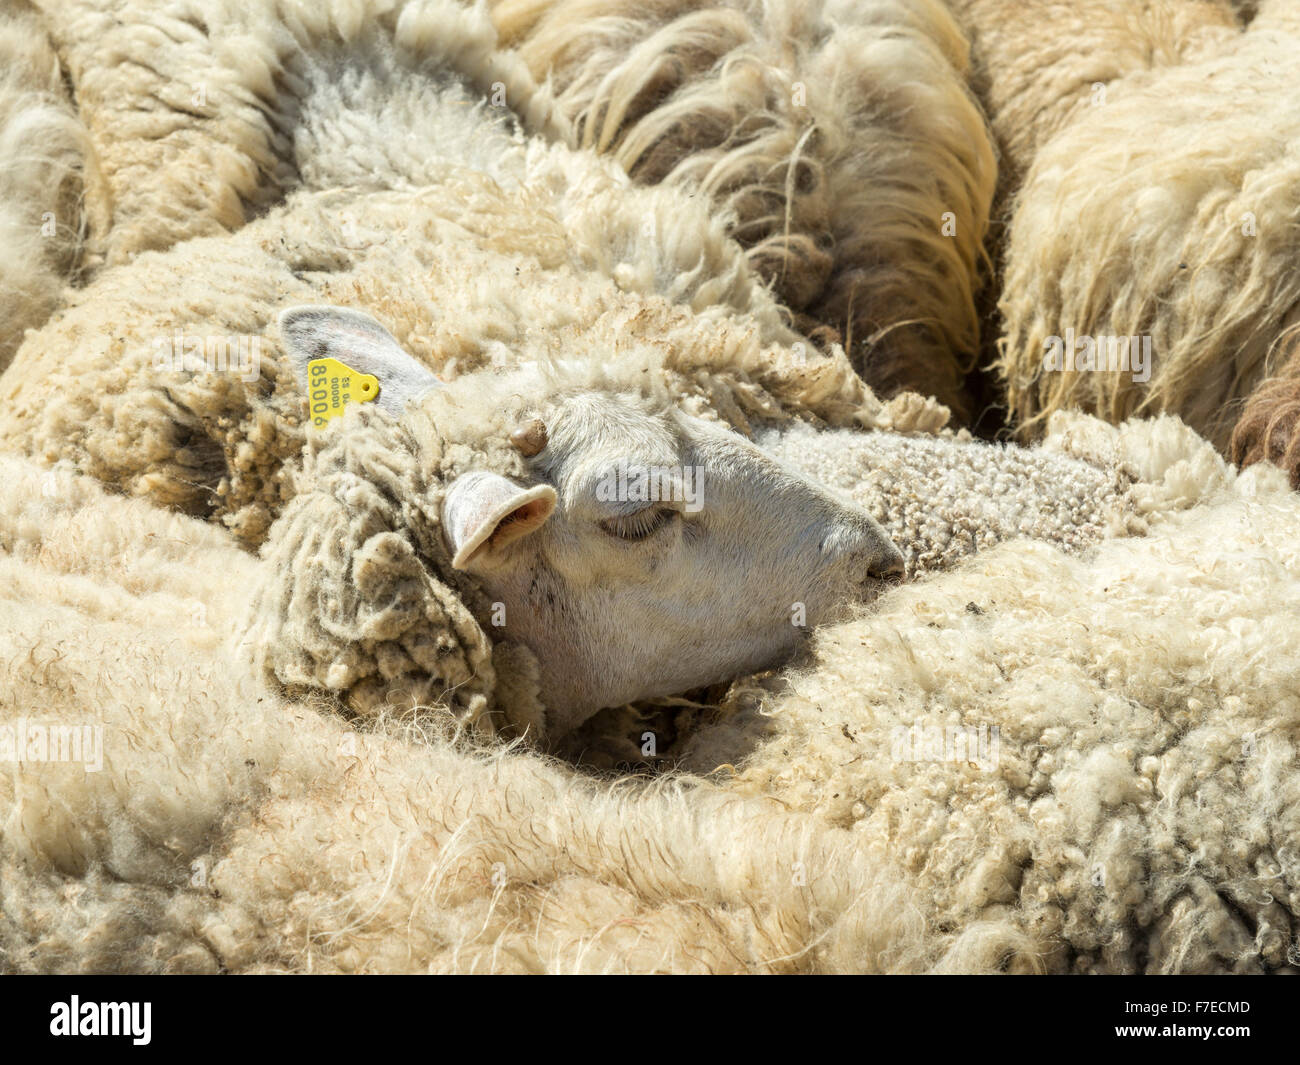 Flock of sheep, Brez, Cantabria, Spain - Stock Image